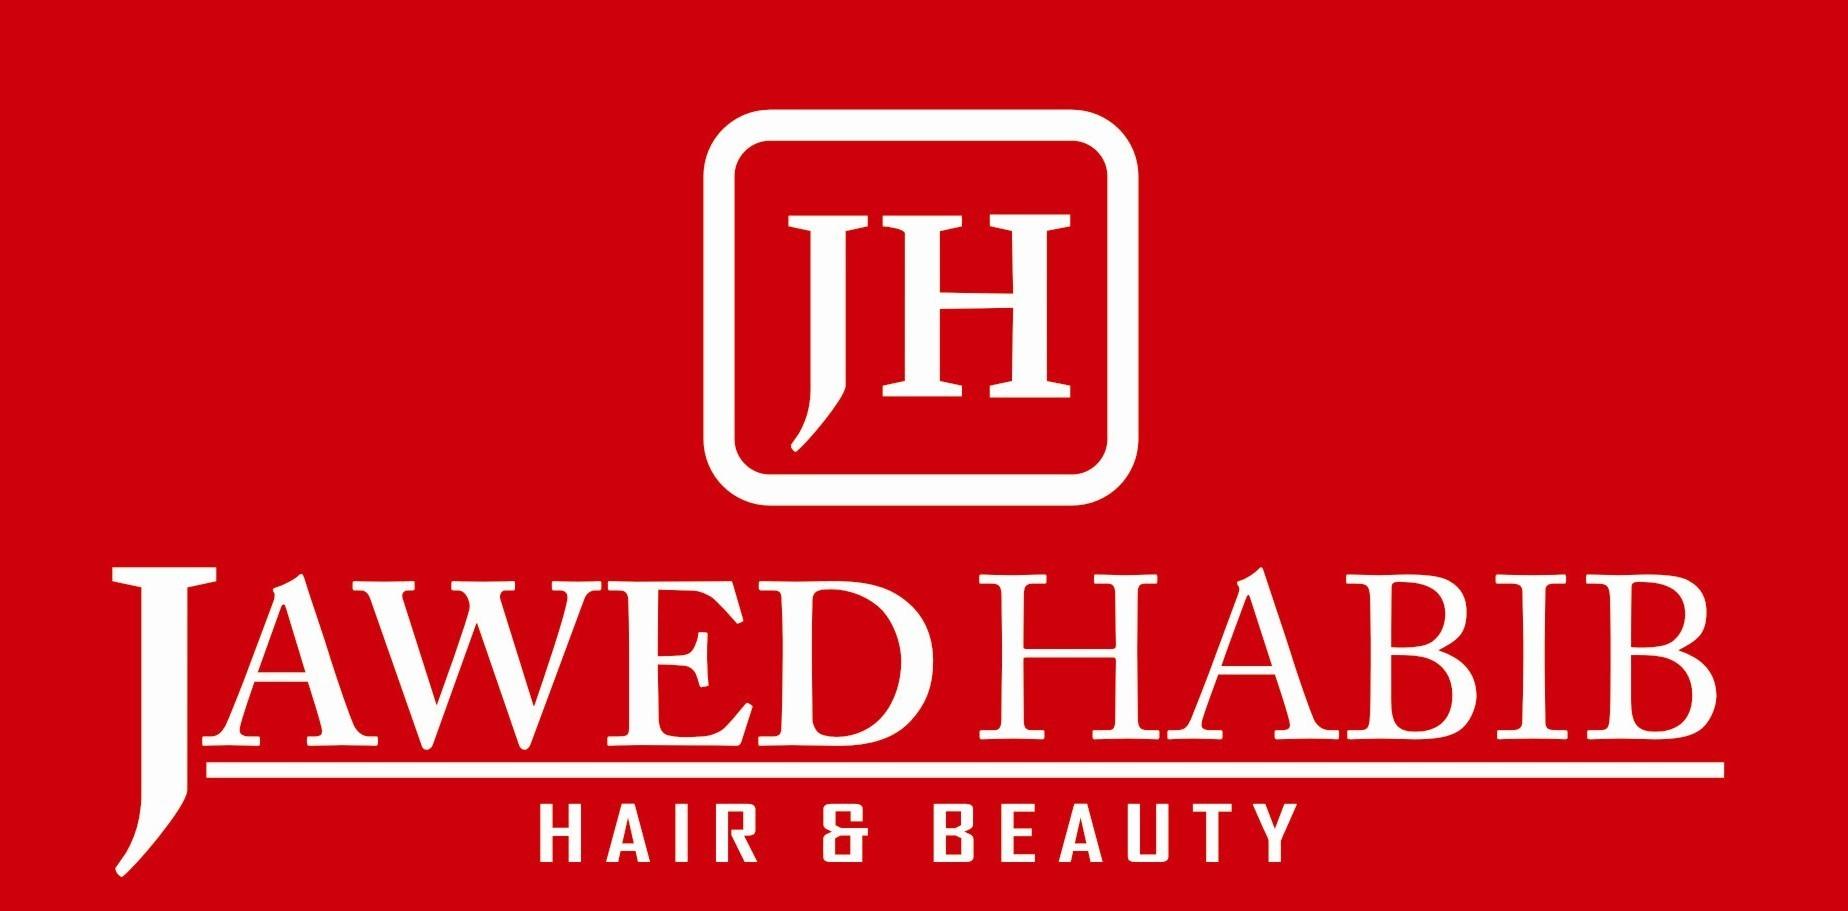 Jawed Habib Hair & Beauty Salons - Ausa Road - Latur Image